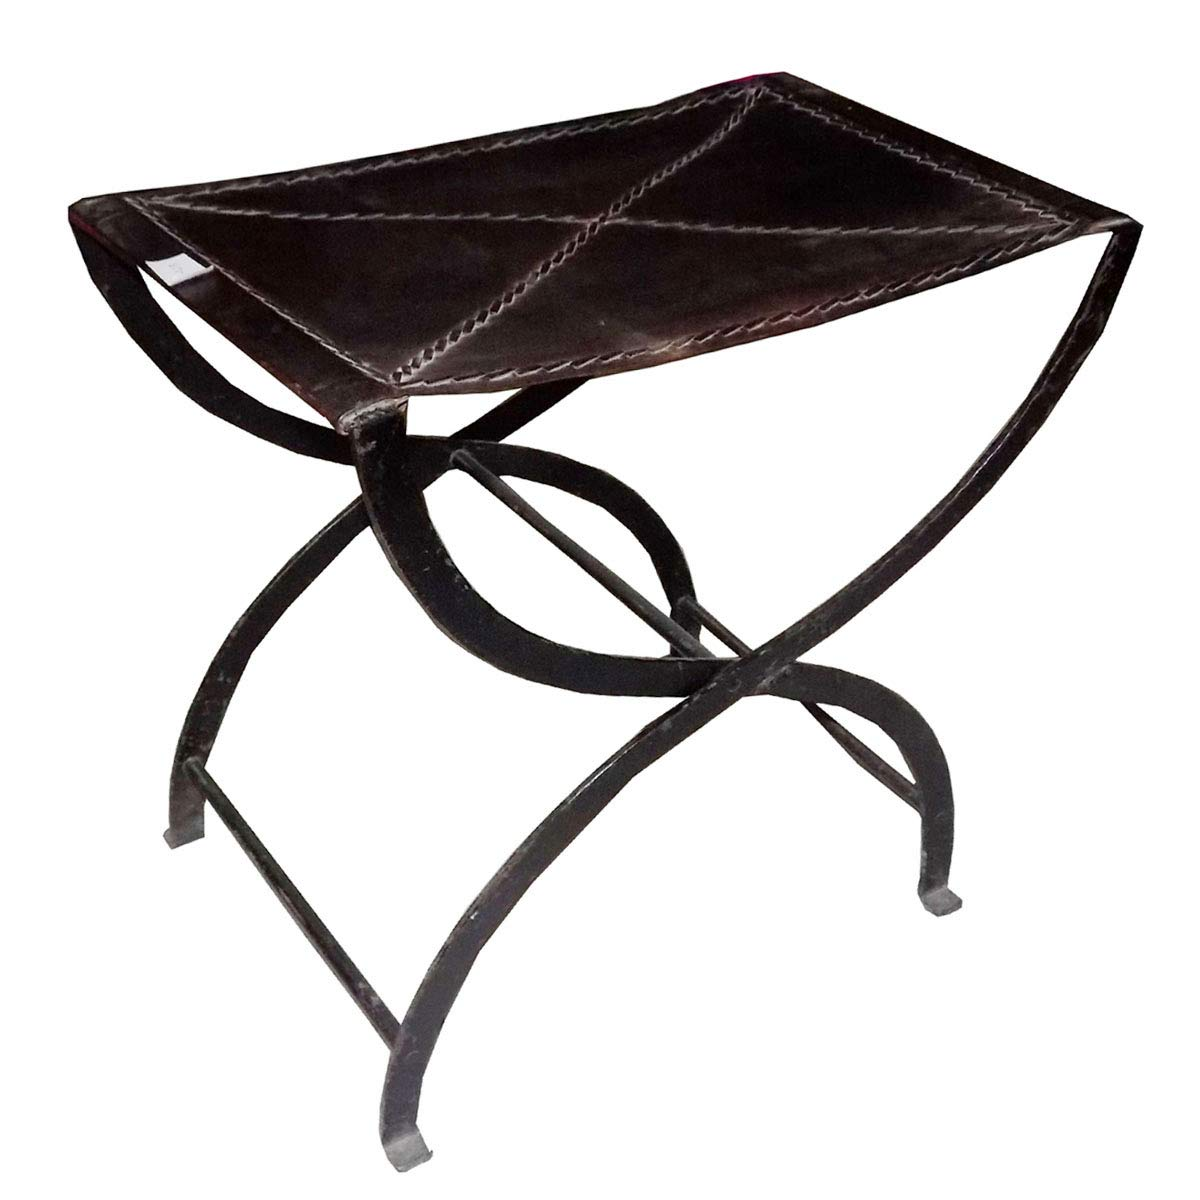 Superb Kushal Handicrafts Black Color Iron Leather Folding Stool Pabps2019 Chair Design Images Pabps2019Com